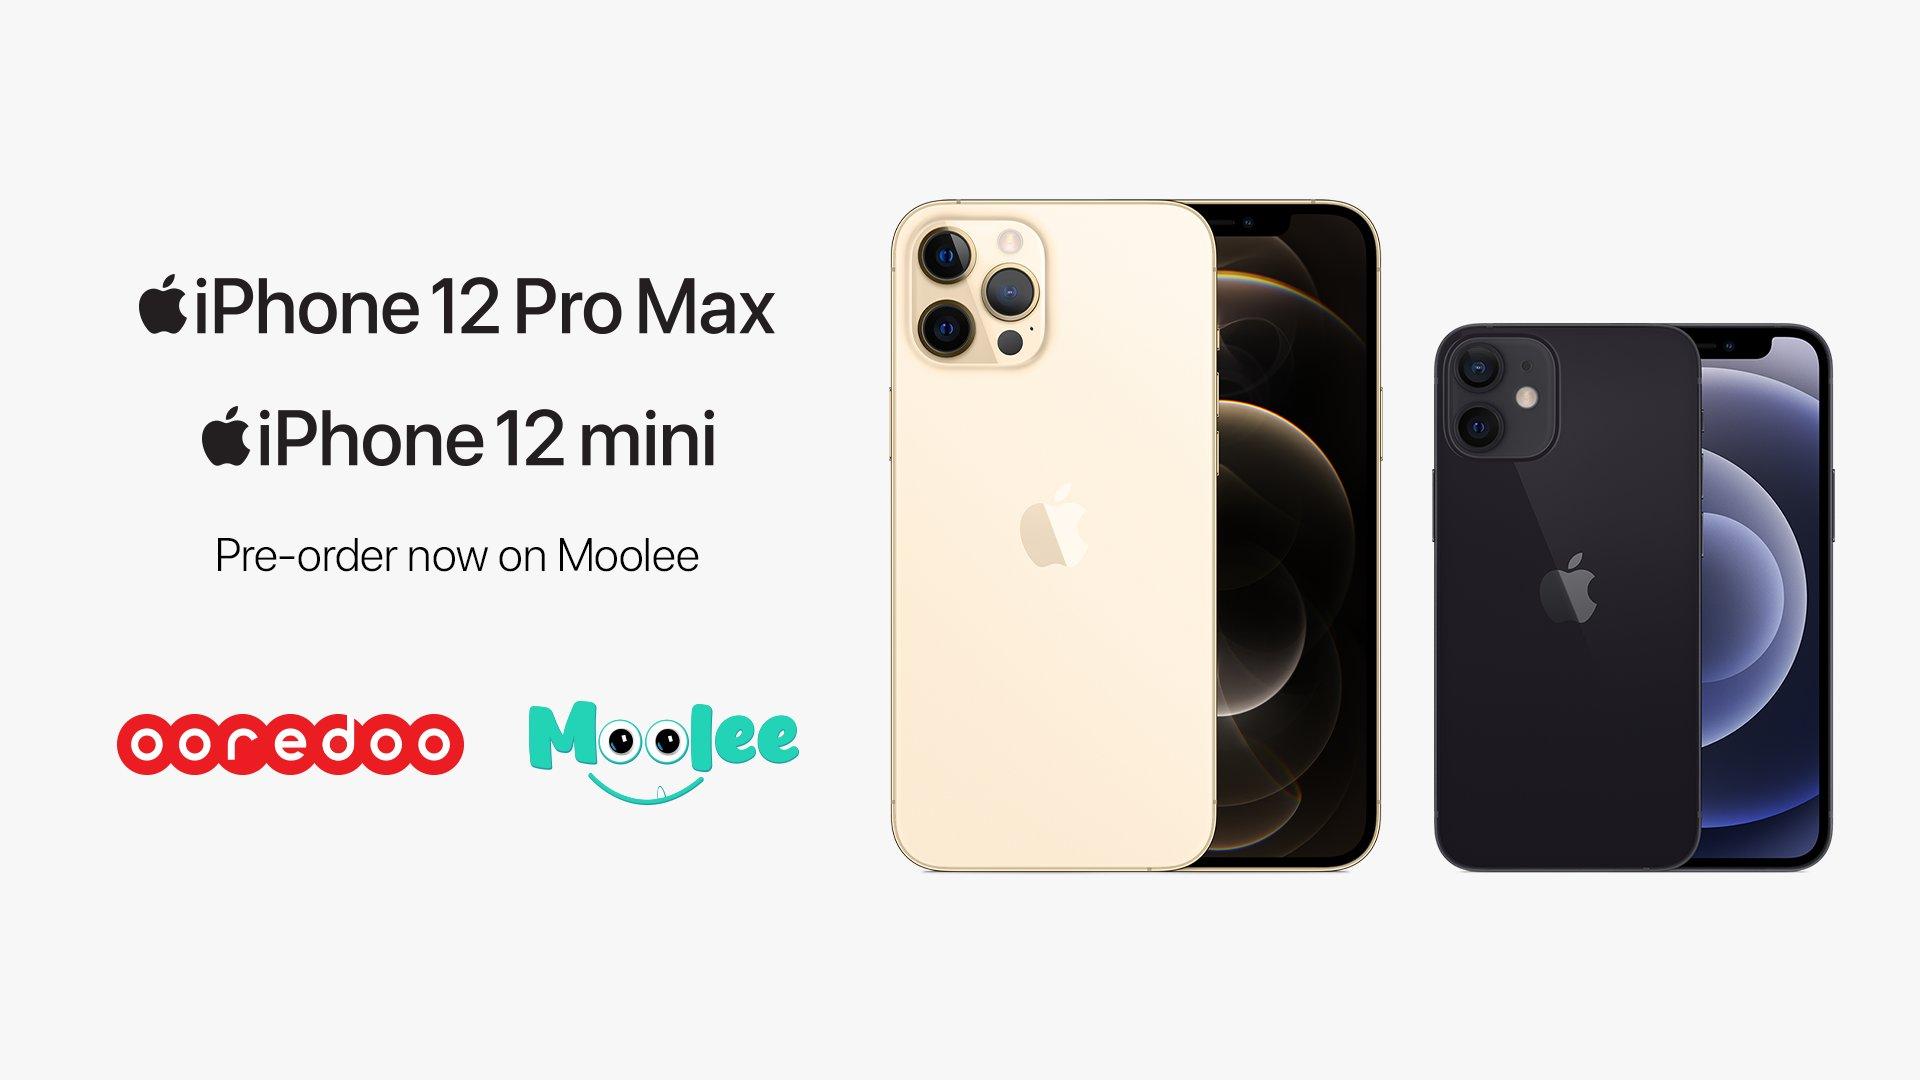 iphone 12 ooredoo